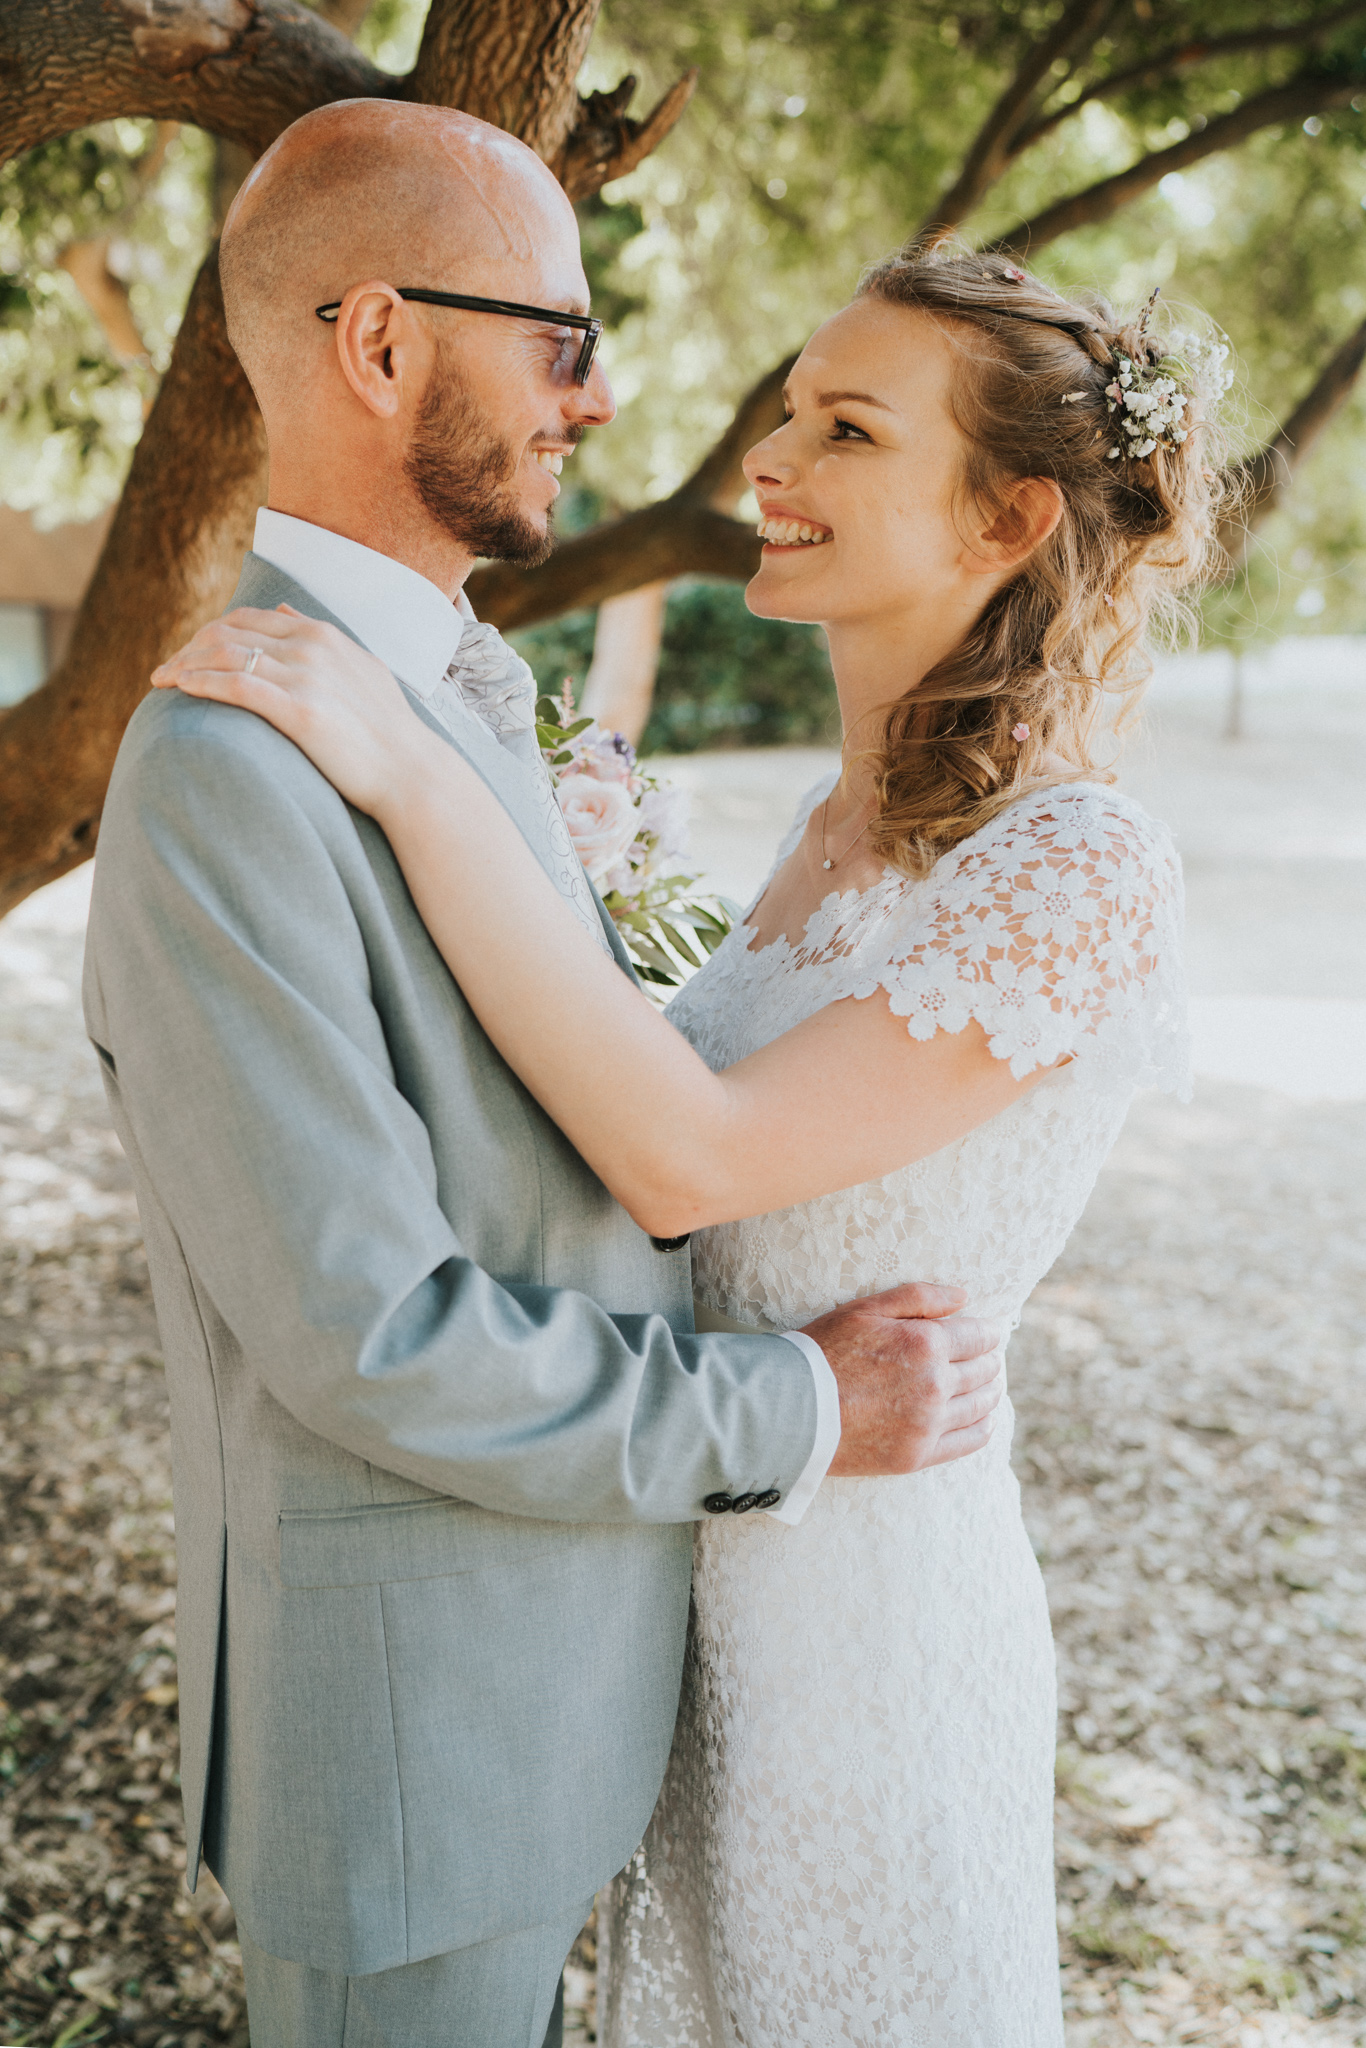 Grace-Elizabeth-Georgie-Amalaketu-Firstsite-Colchester-Essex-Boho-Buddhist-Wedding-Alternative-Wedding-Photography-Essex (79 of 100).jpg